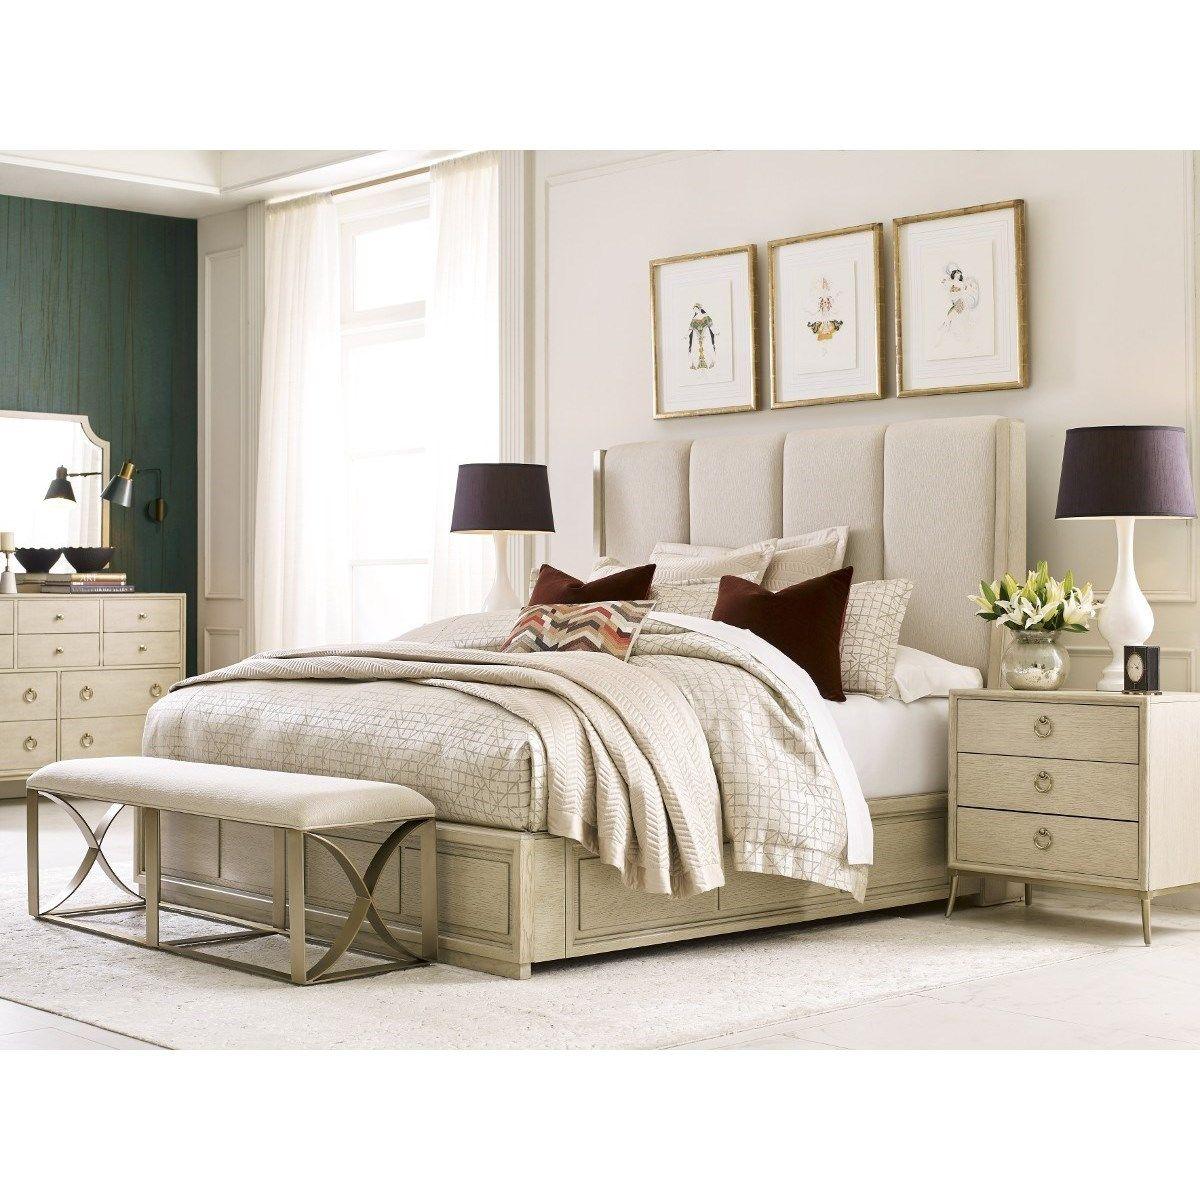 Lenox King Bedroom Group By American Drew At Wayside Furniture Bedroom Panel King Bedroom Bedroom Set